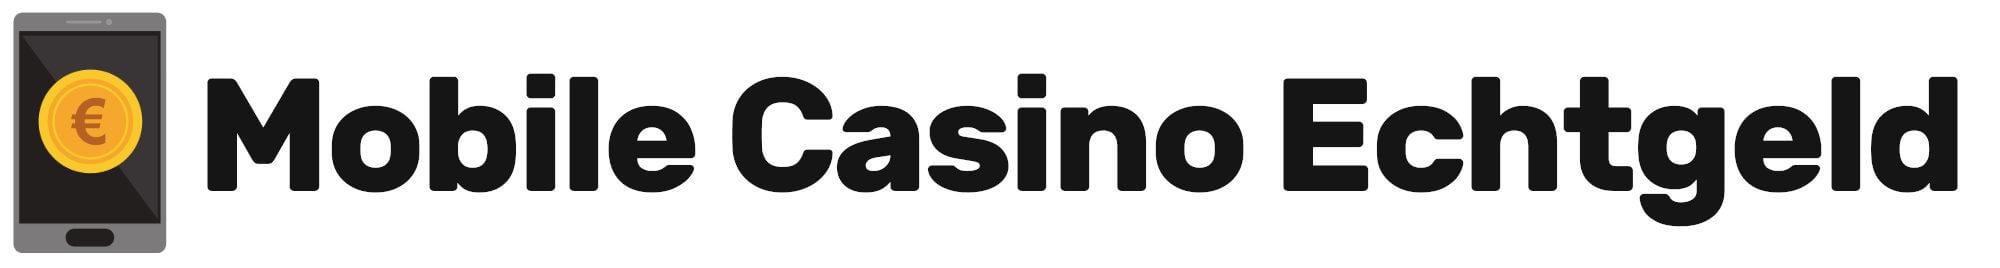 Mobile Casino Echtgeld